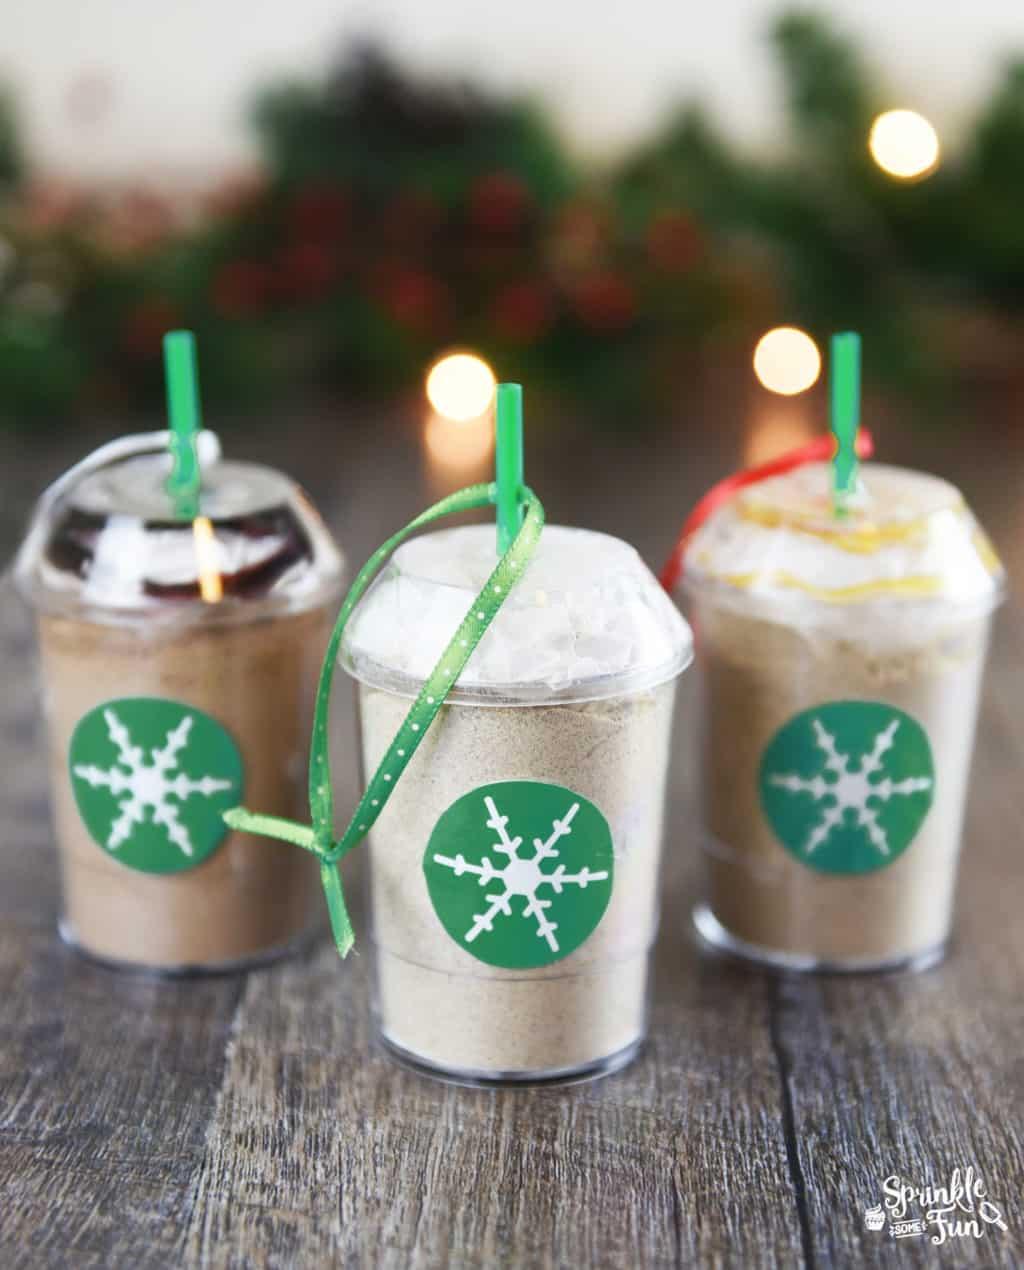 Diy Sprinkle Ornaments: DIY Frozen Coffee Mix Ornaments